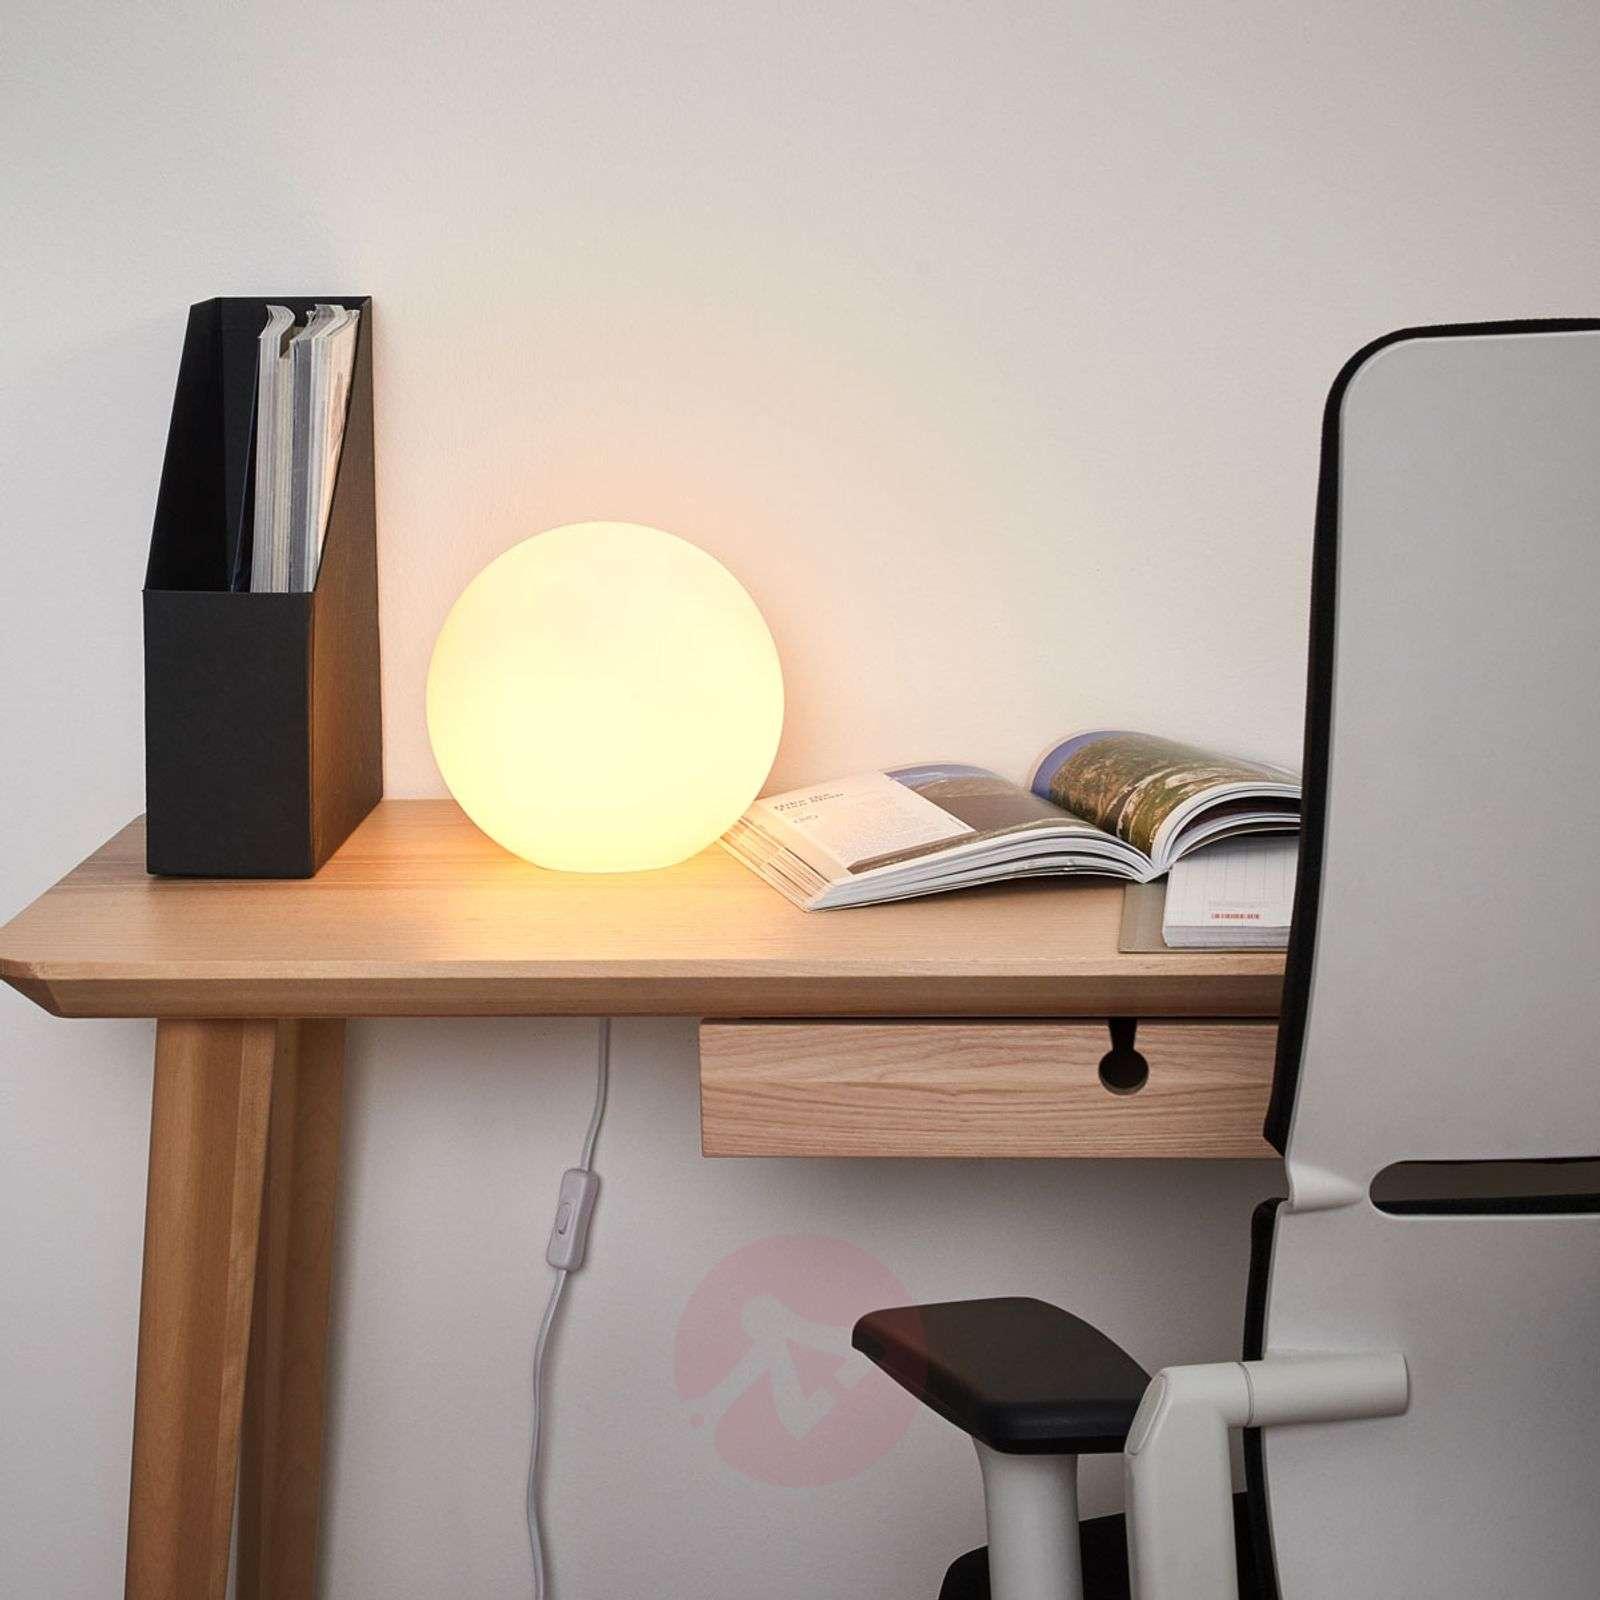 Ball shaped table lamp KIIA-7500216-01